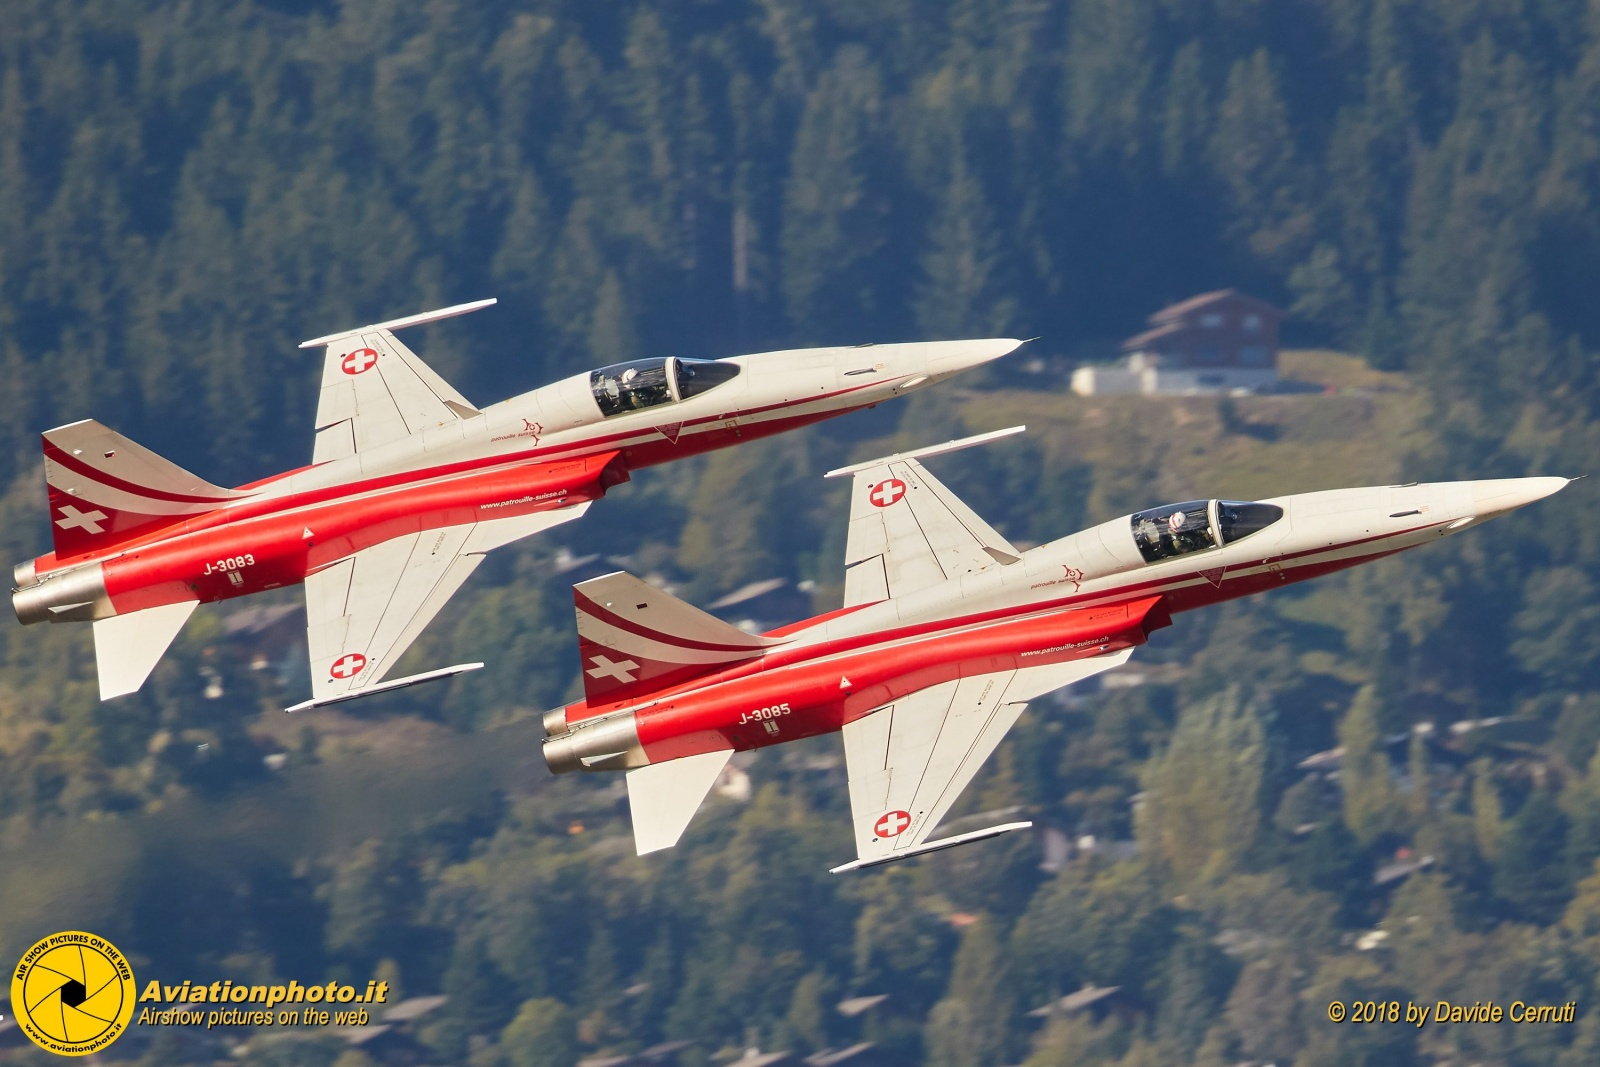 Breitling Airshow - Sion Air Base